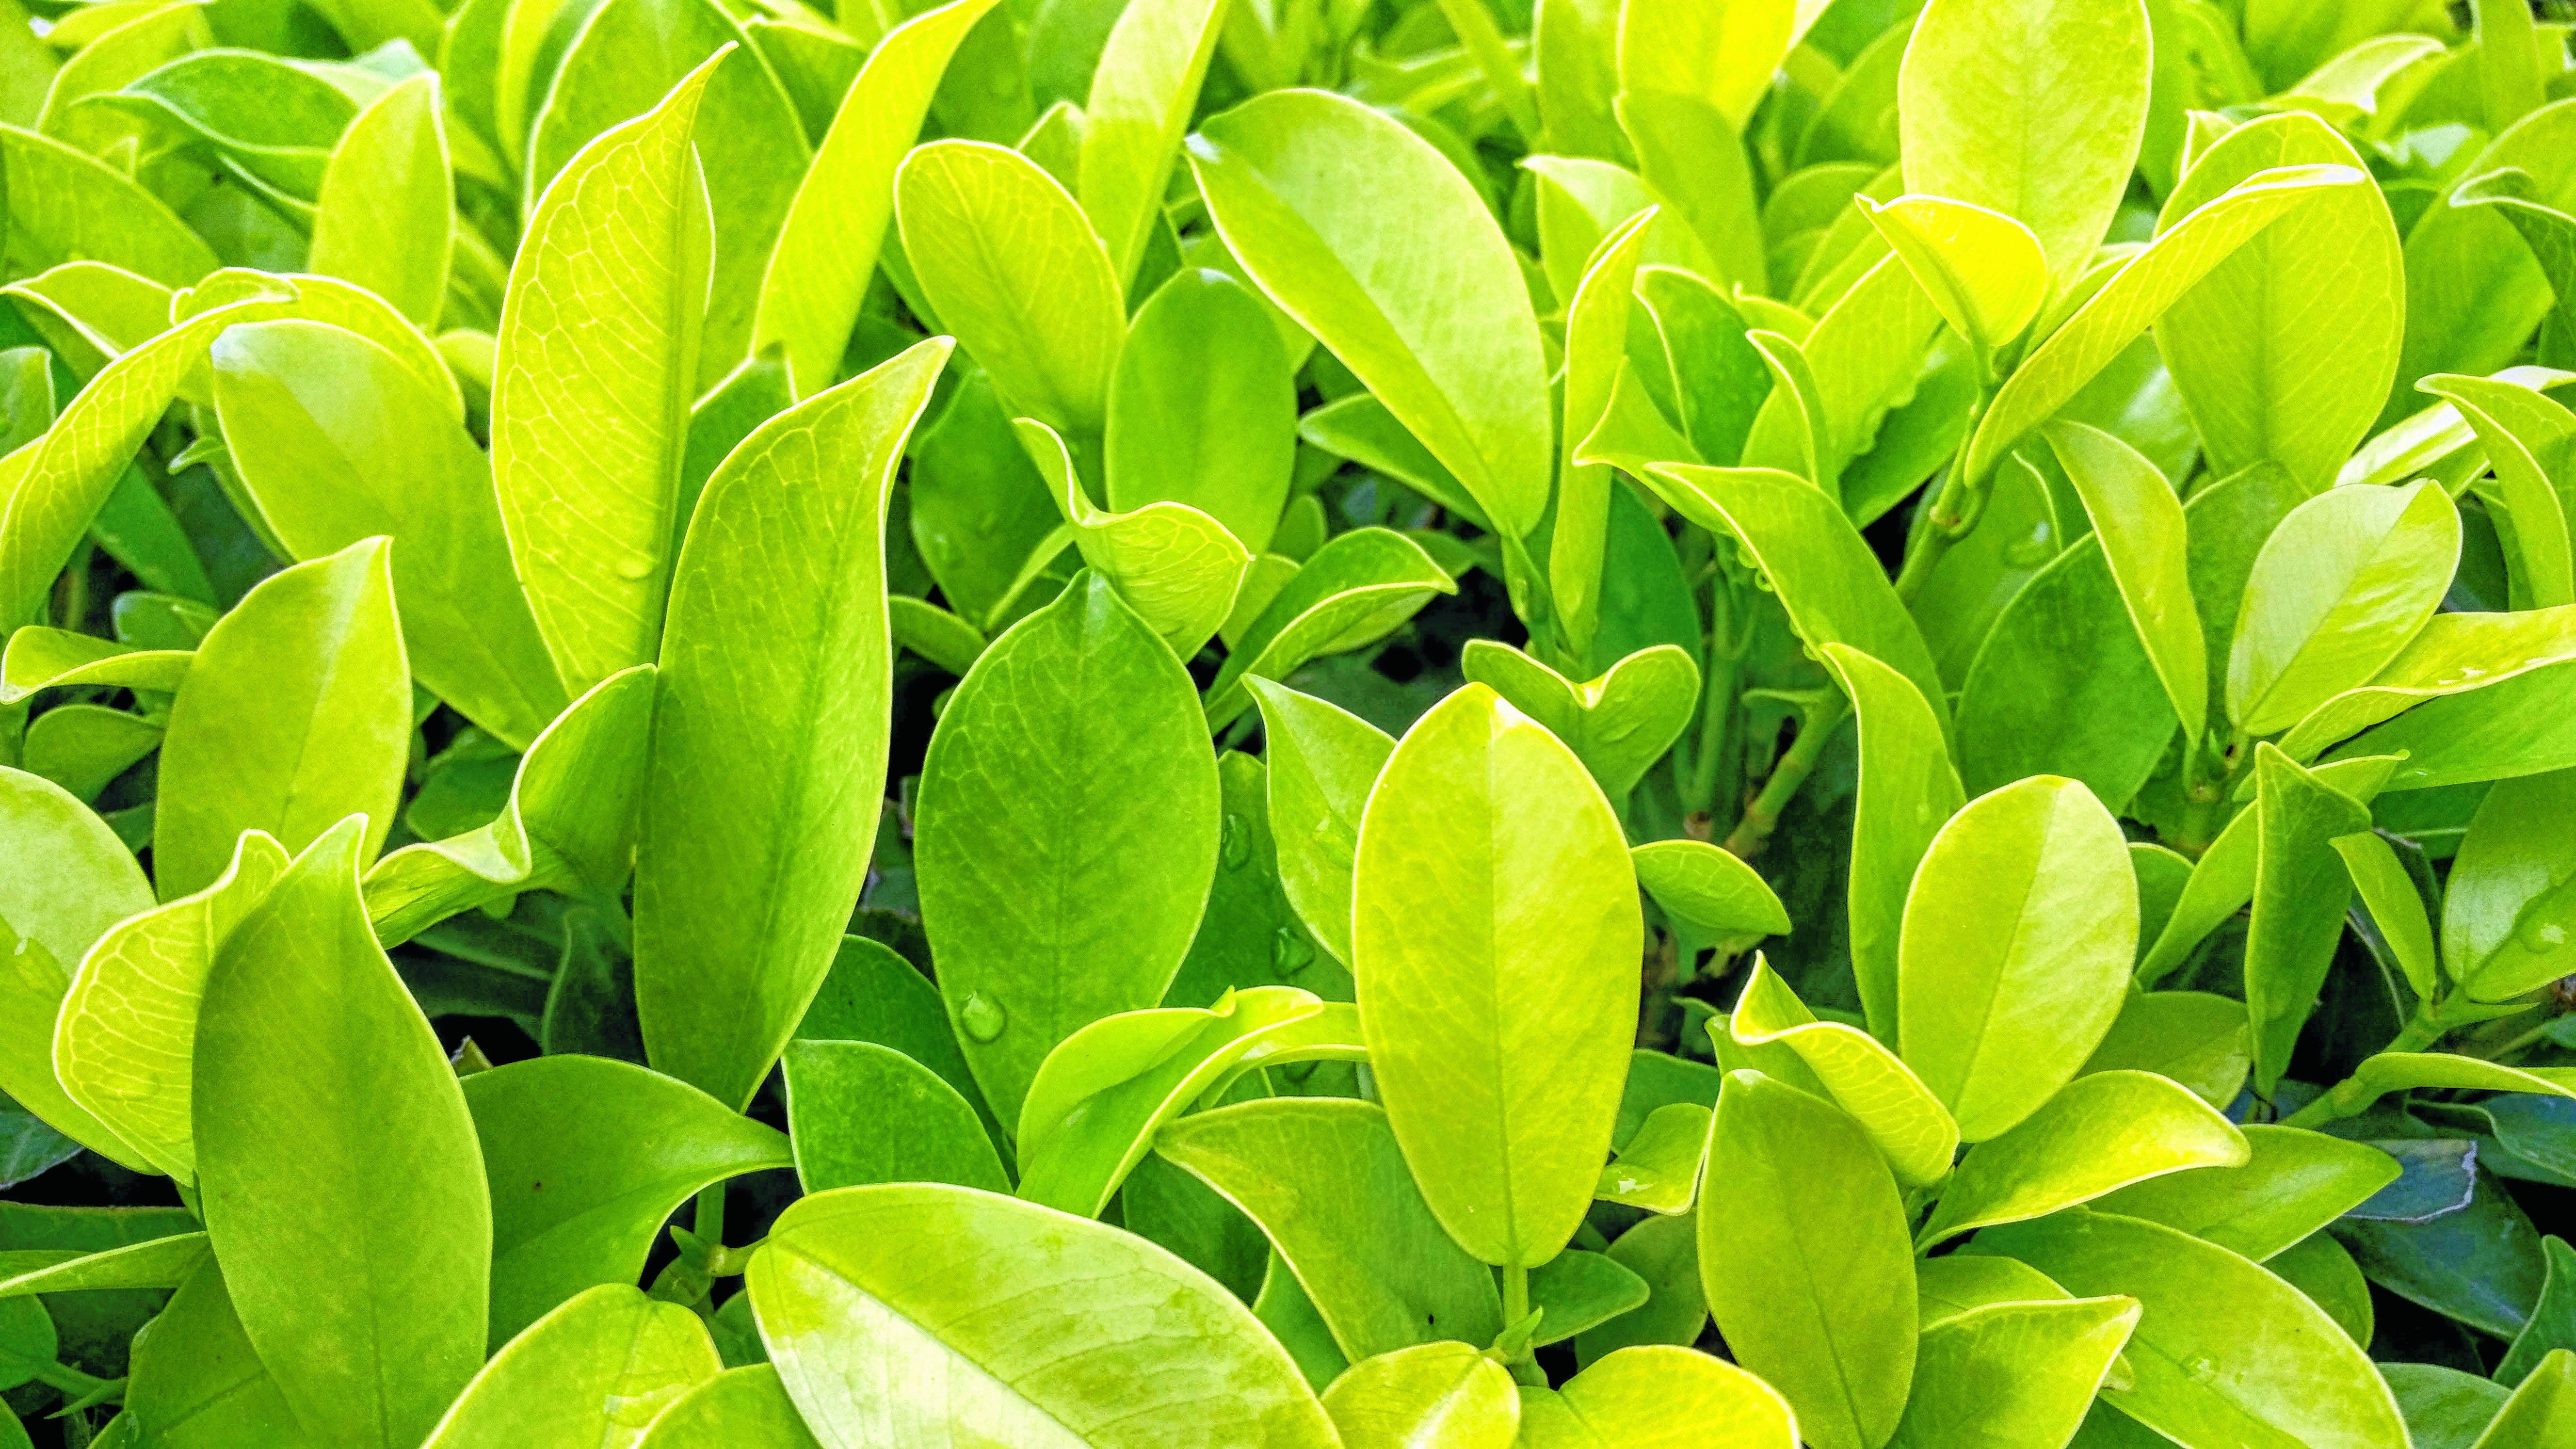 botanical, bright, close-up